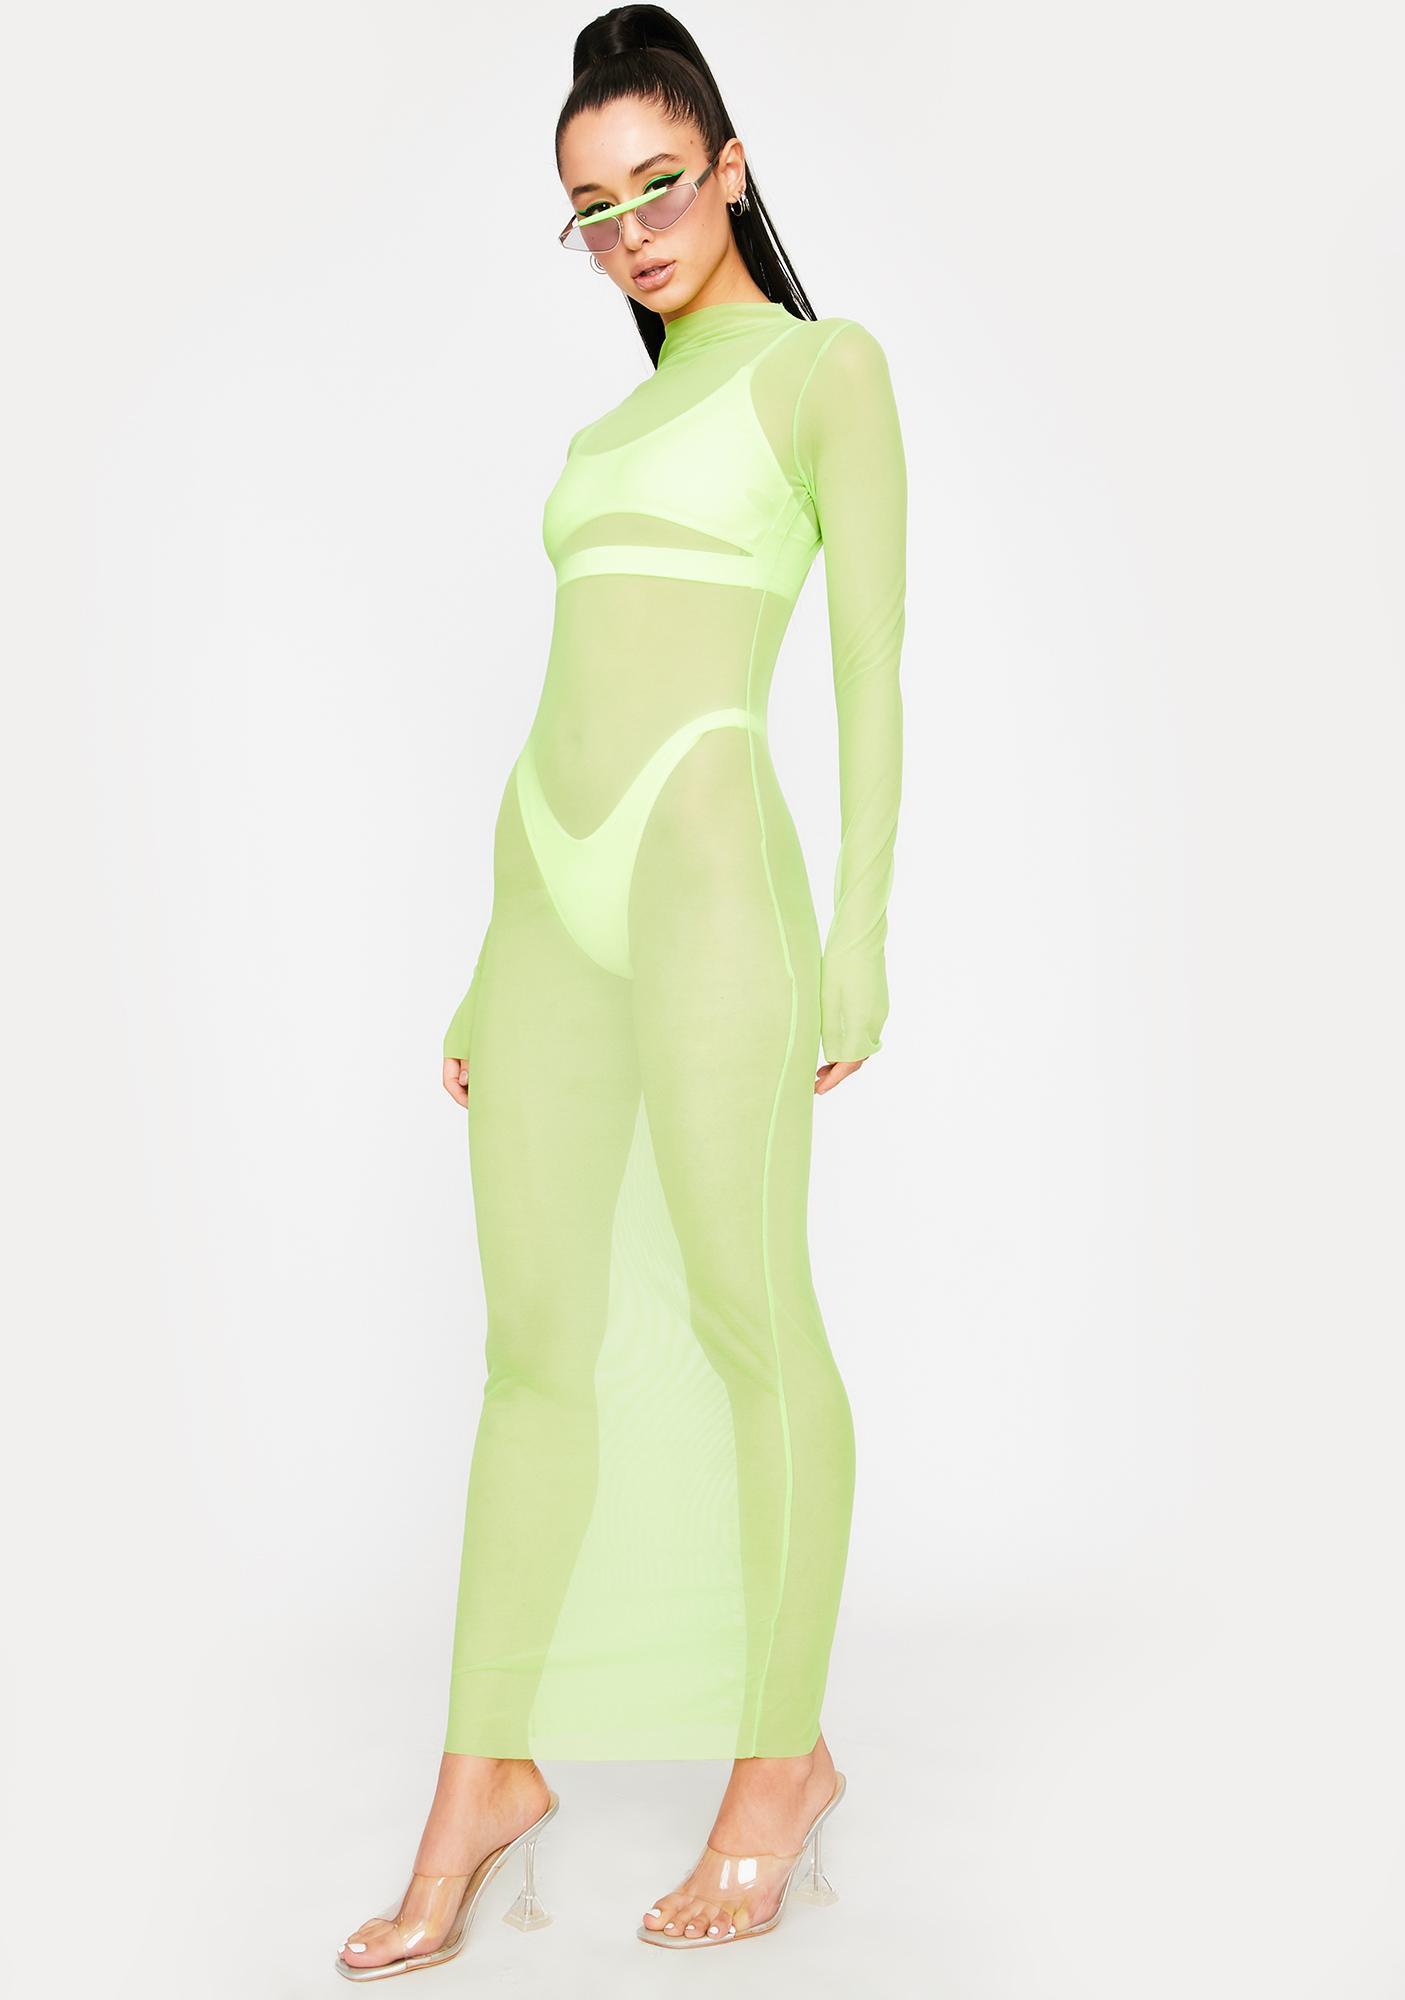 OH SHIT Green Godai Mesh Maxi Dress